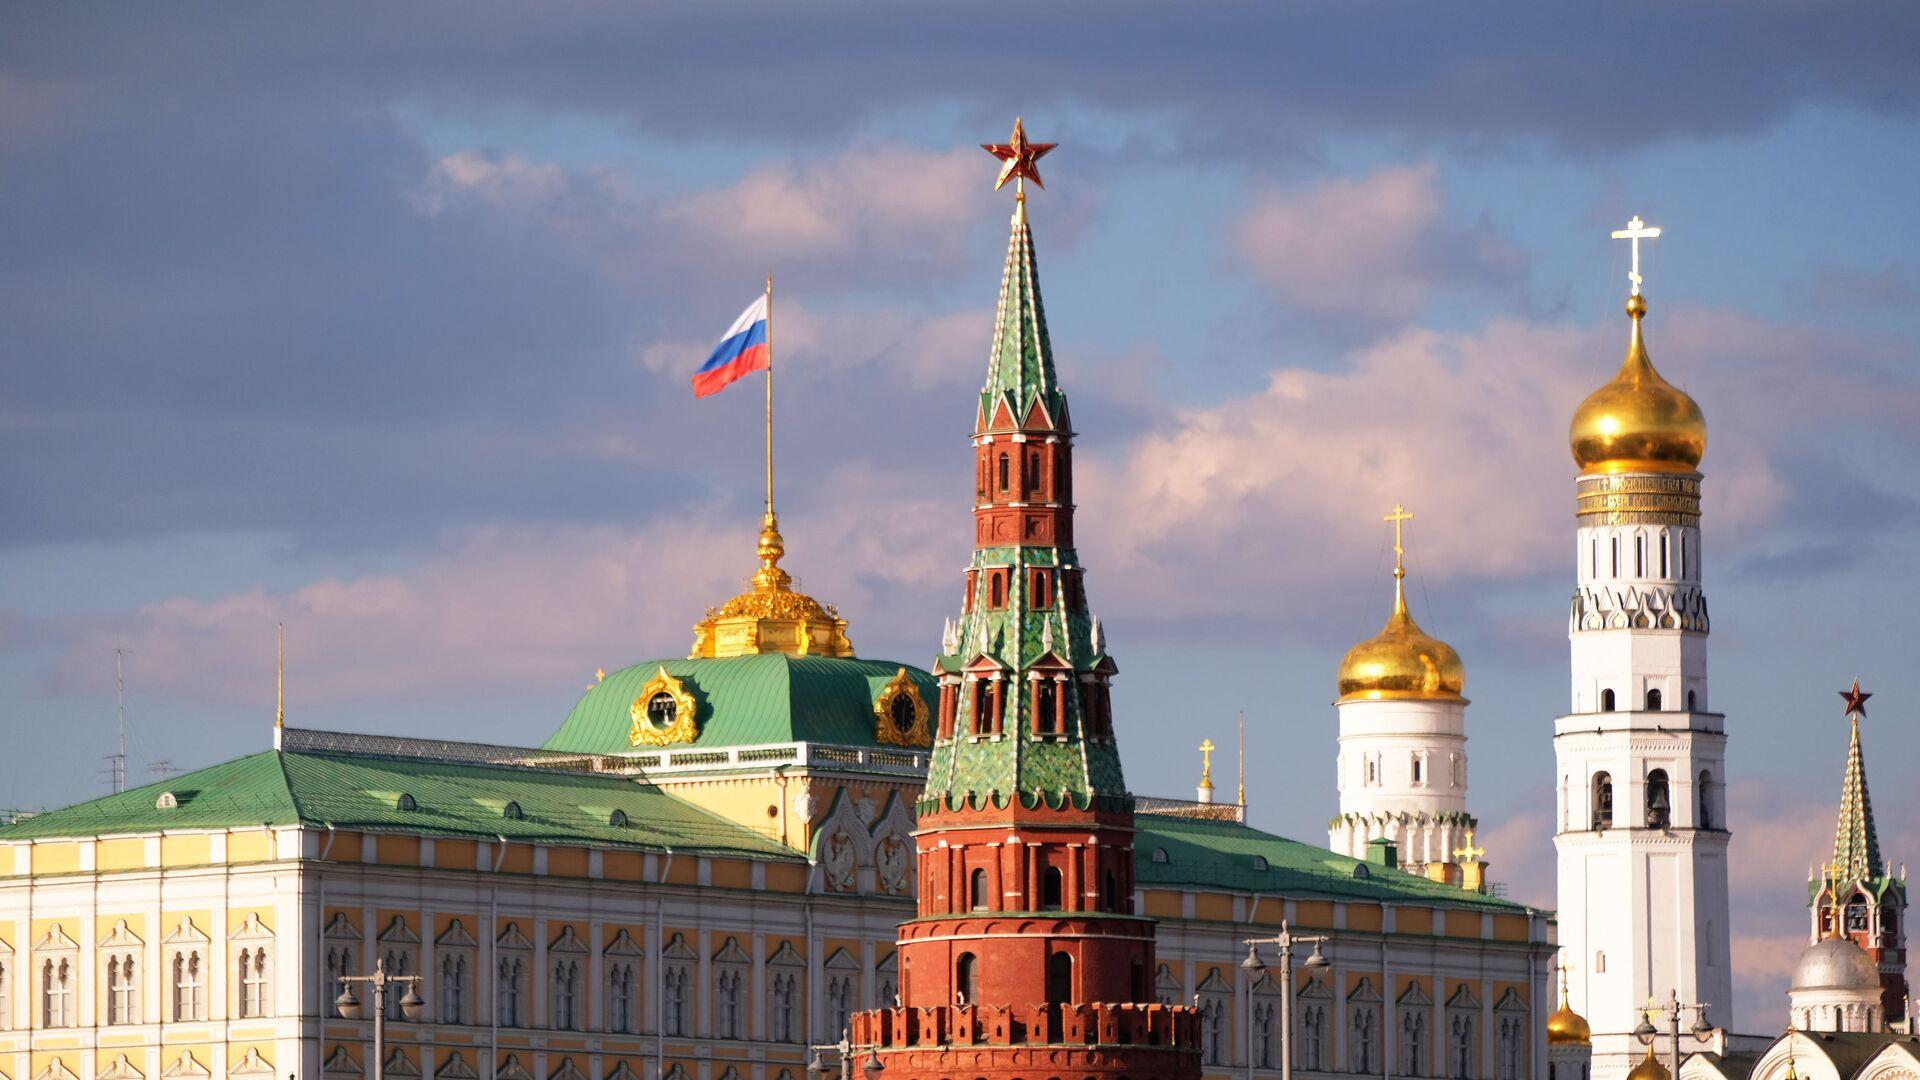 El Kremlin de Moscú - Sputnik Mundo, 1920, 22.06.2021